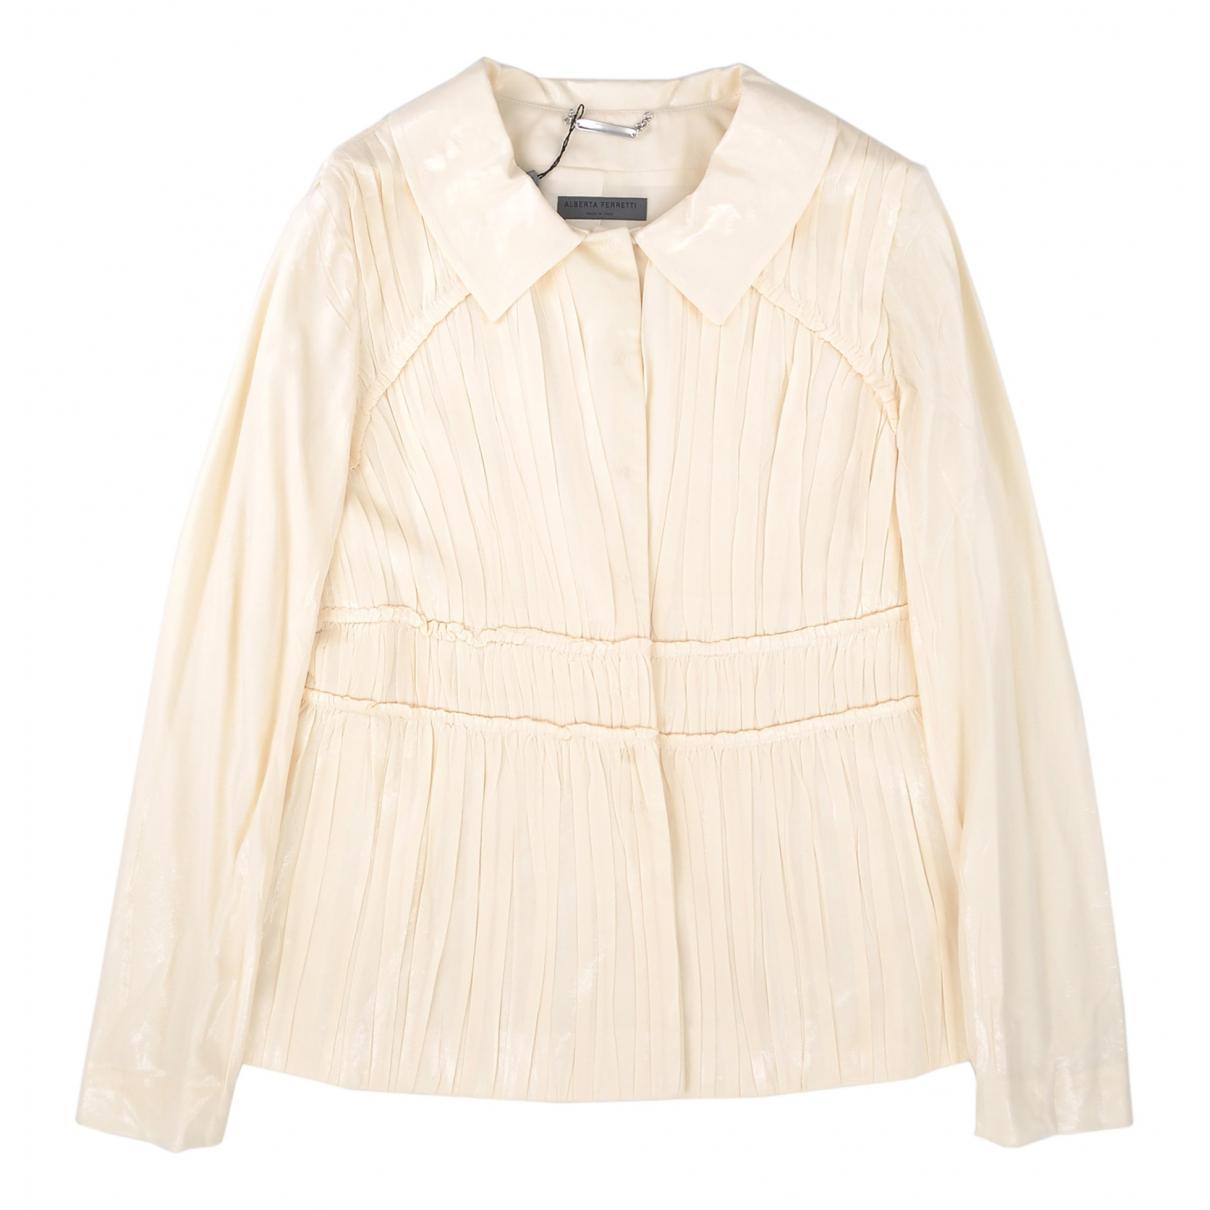 Alberta Ferretti - Veste   pour femme en coton - jaune